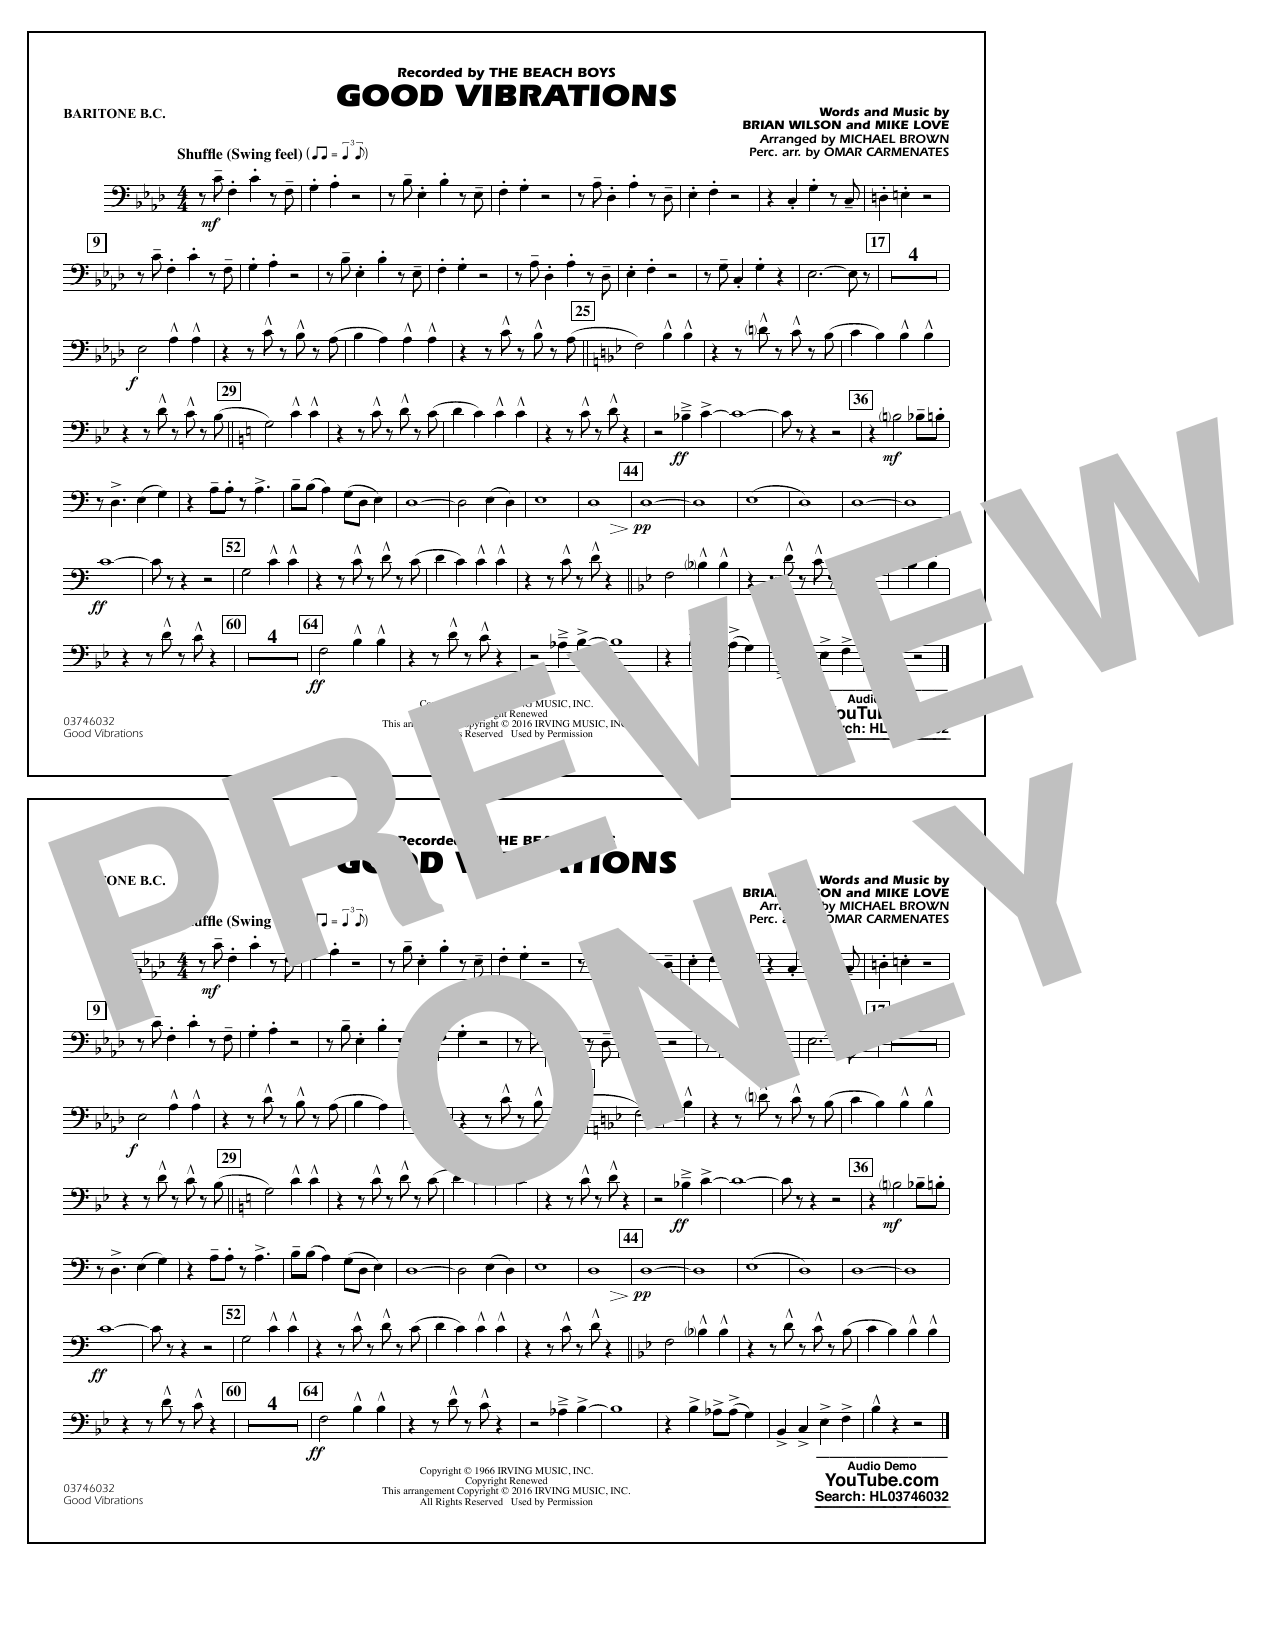 Good Vibrations - Baritone B.C. Sheet Music